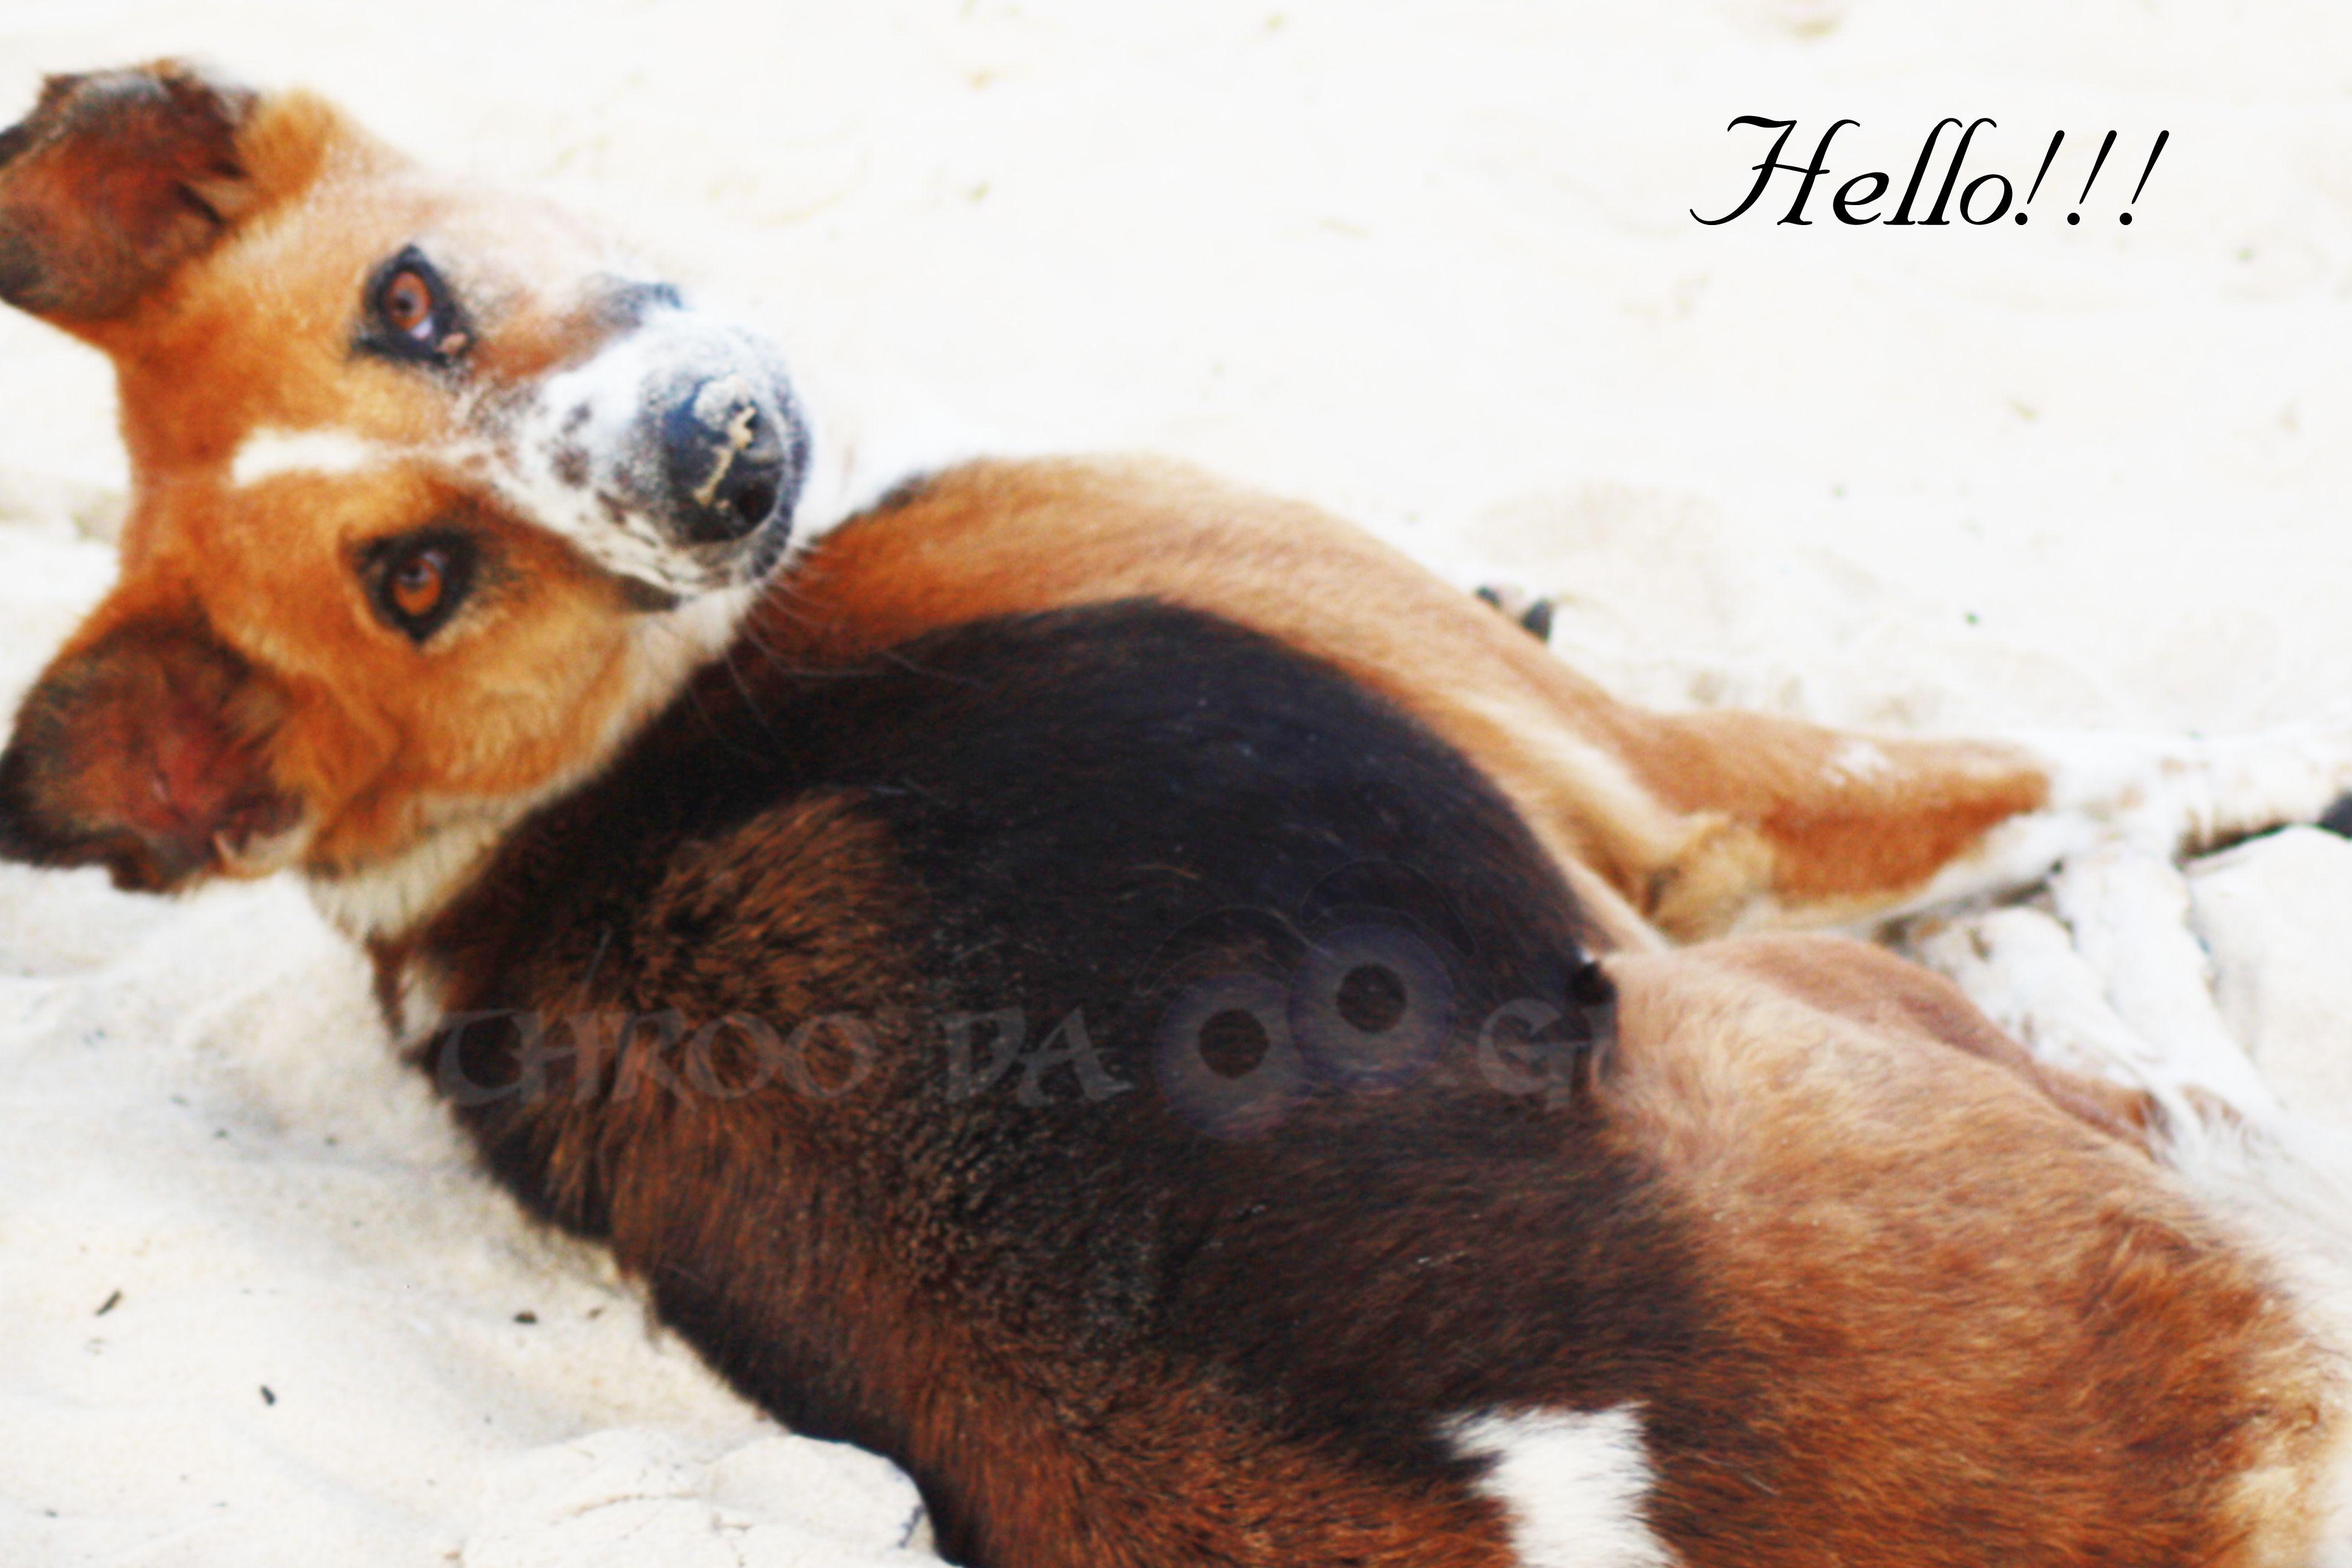 H,hello,sleep,dog,malpe,Udupi,karnataka,beach,pravin,karnataka,throo da looking glass,Bangalore,phenomenon